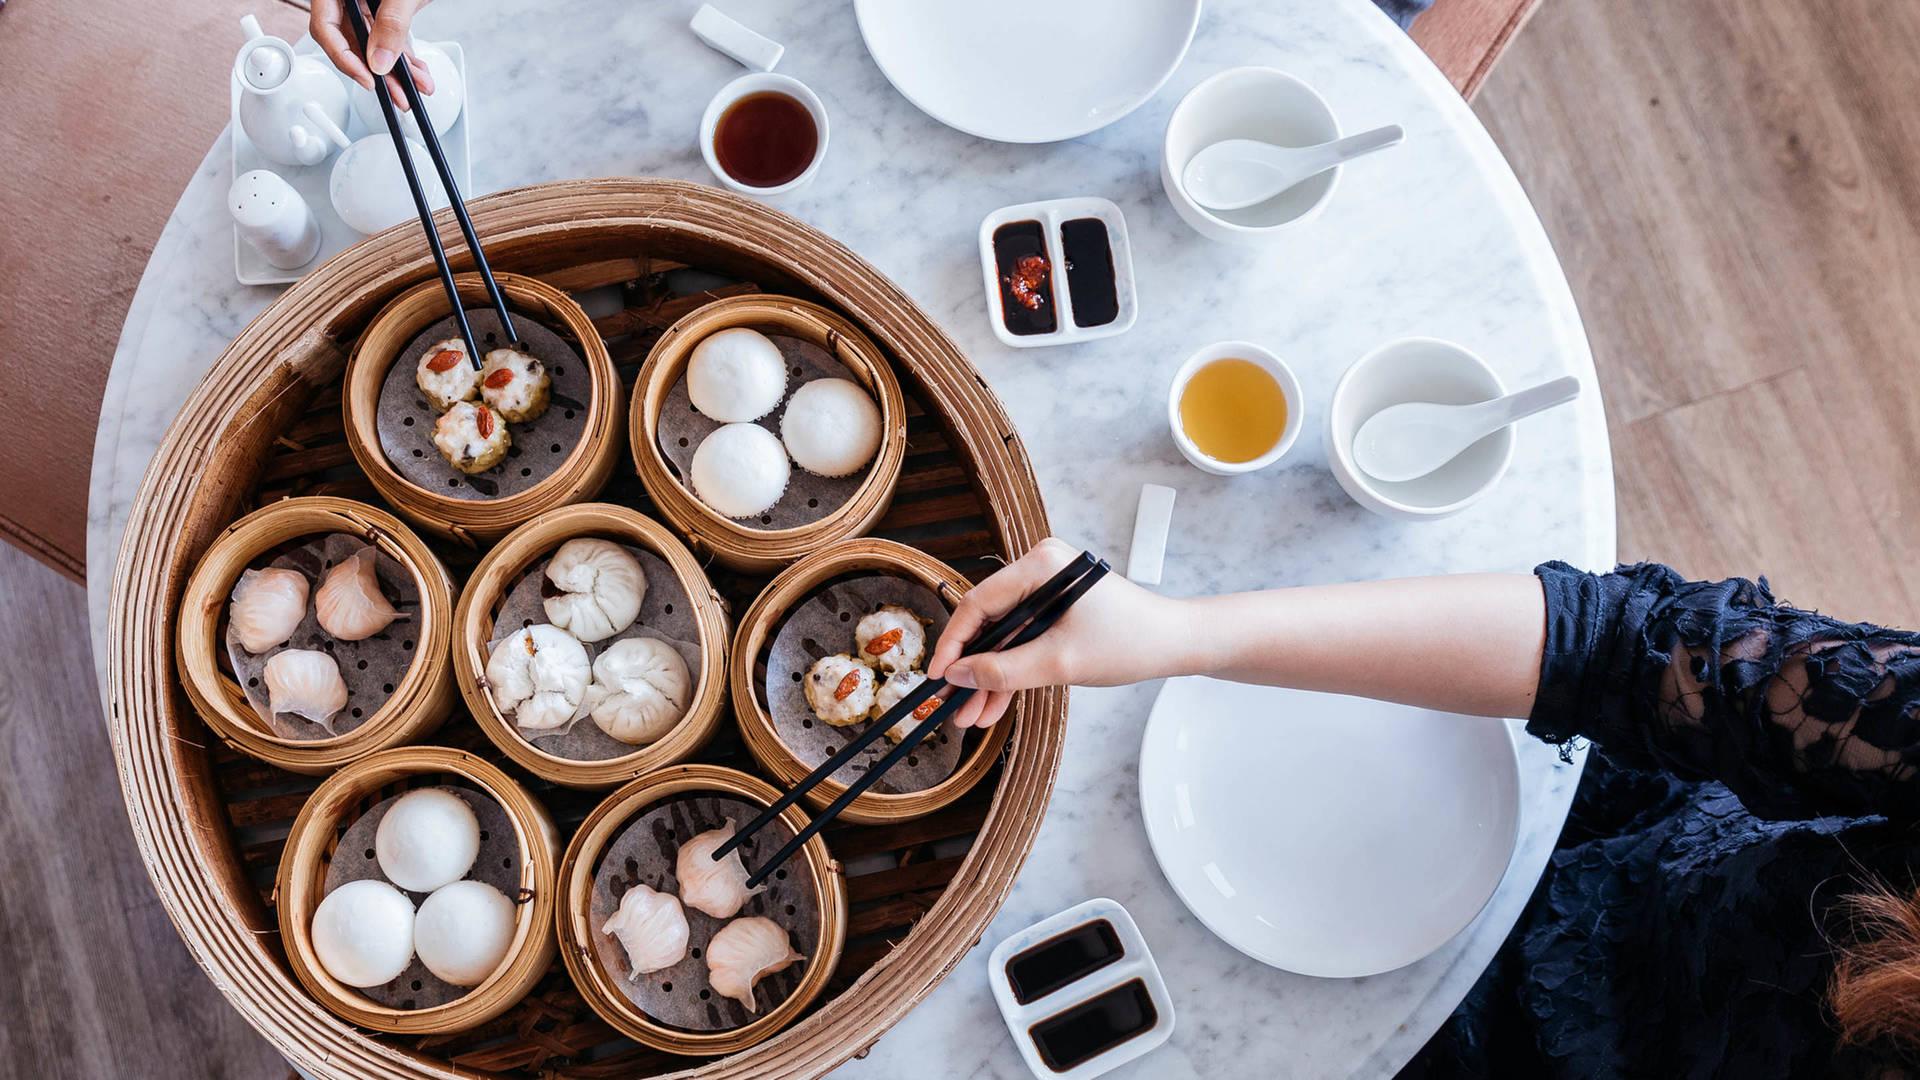 dim sum and buns eat cantonese in guangzhou